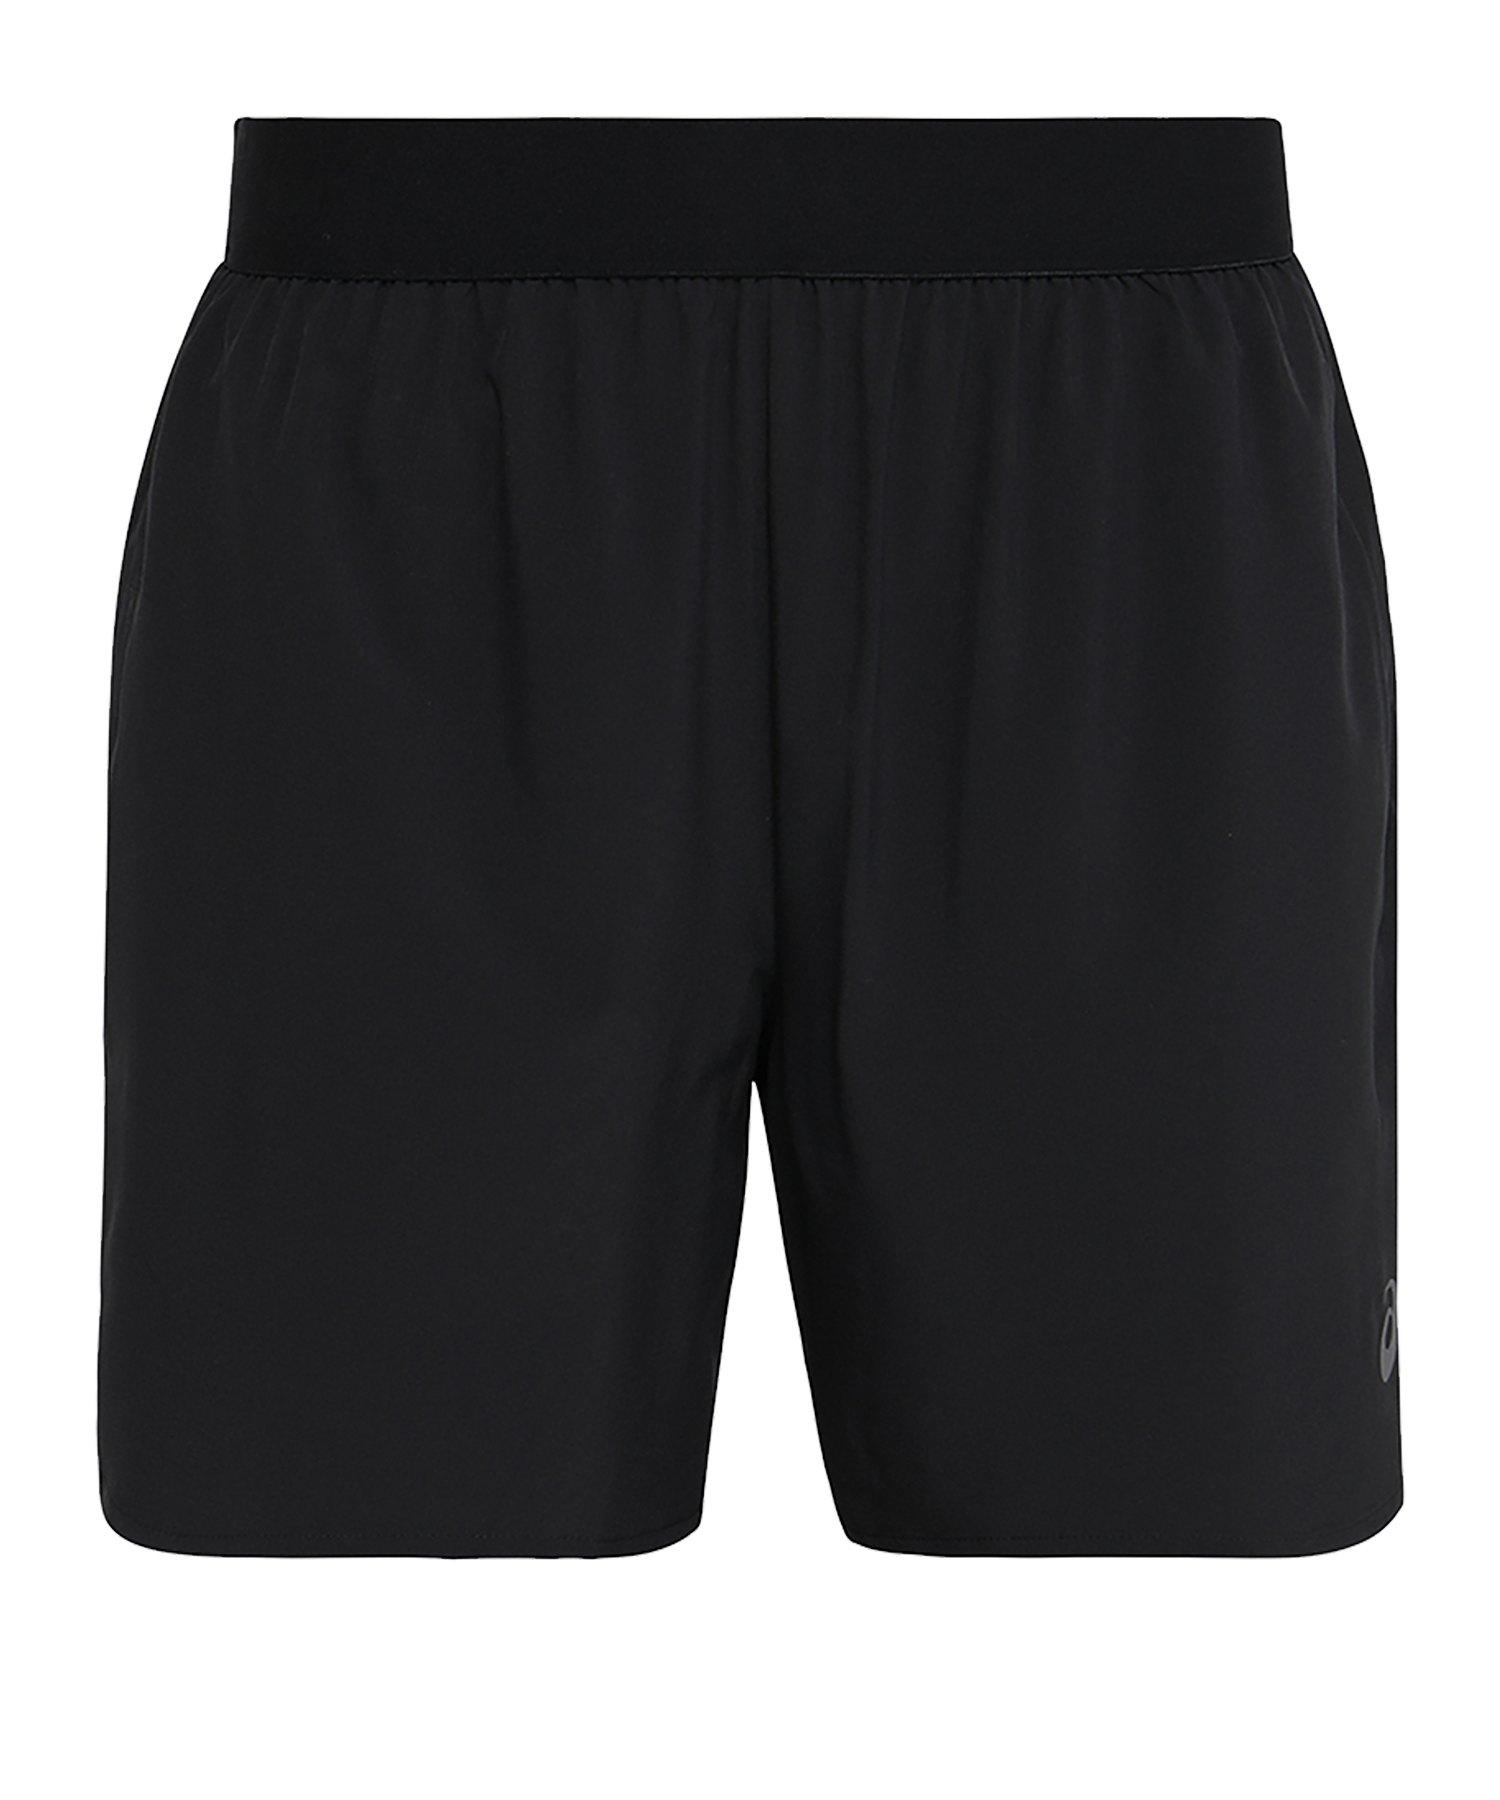 Asics 5IN Sprinter Short Running Damen F001 - schwarz